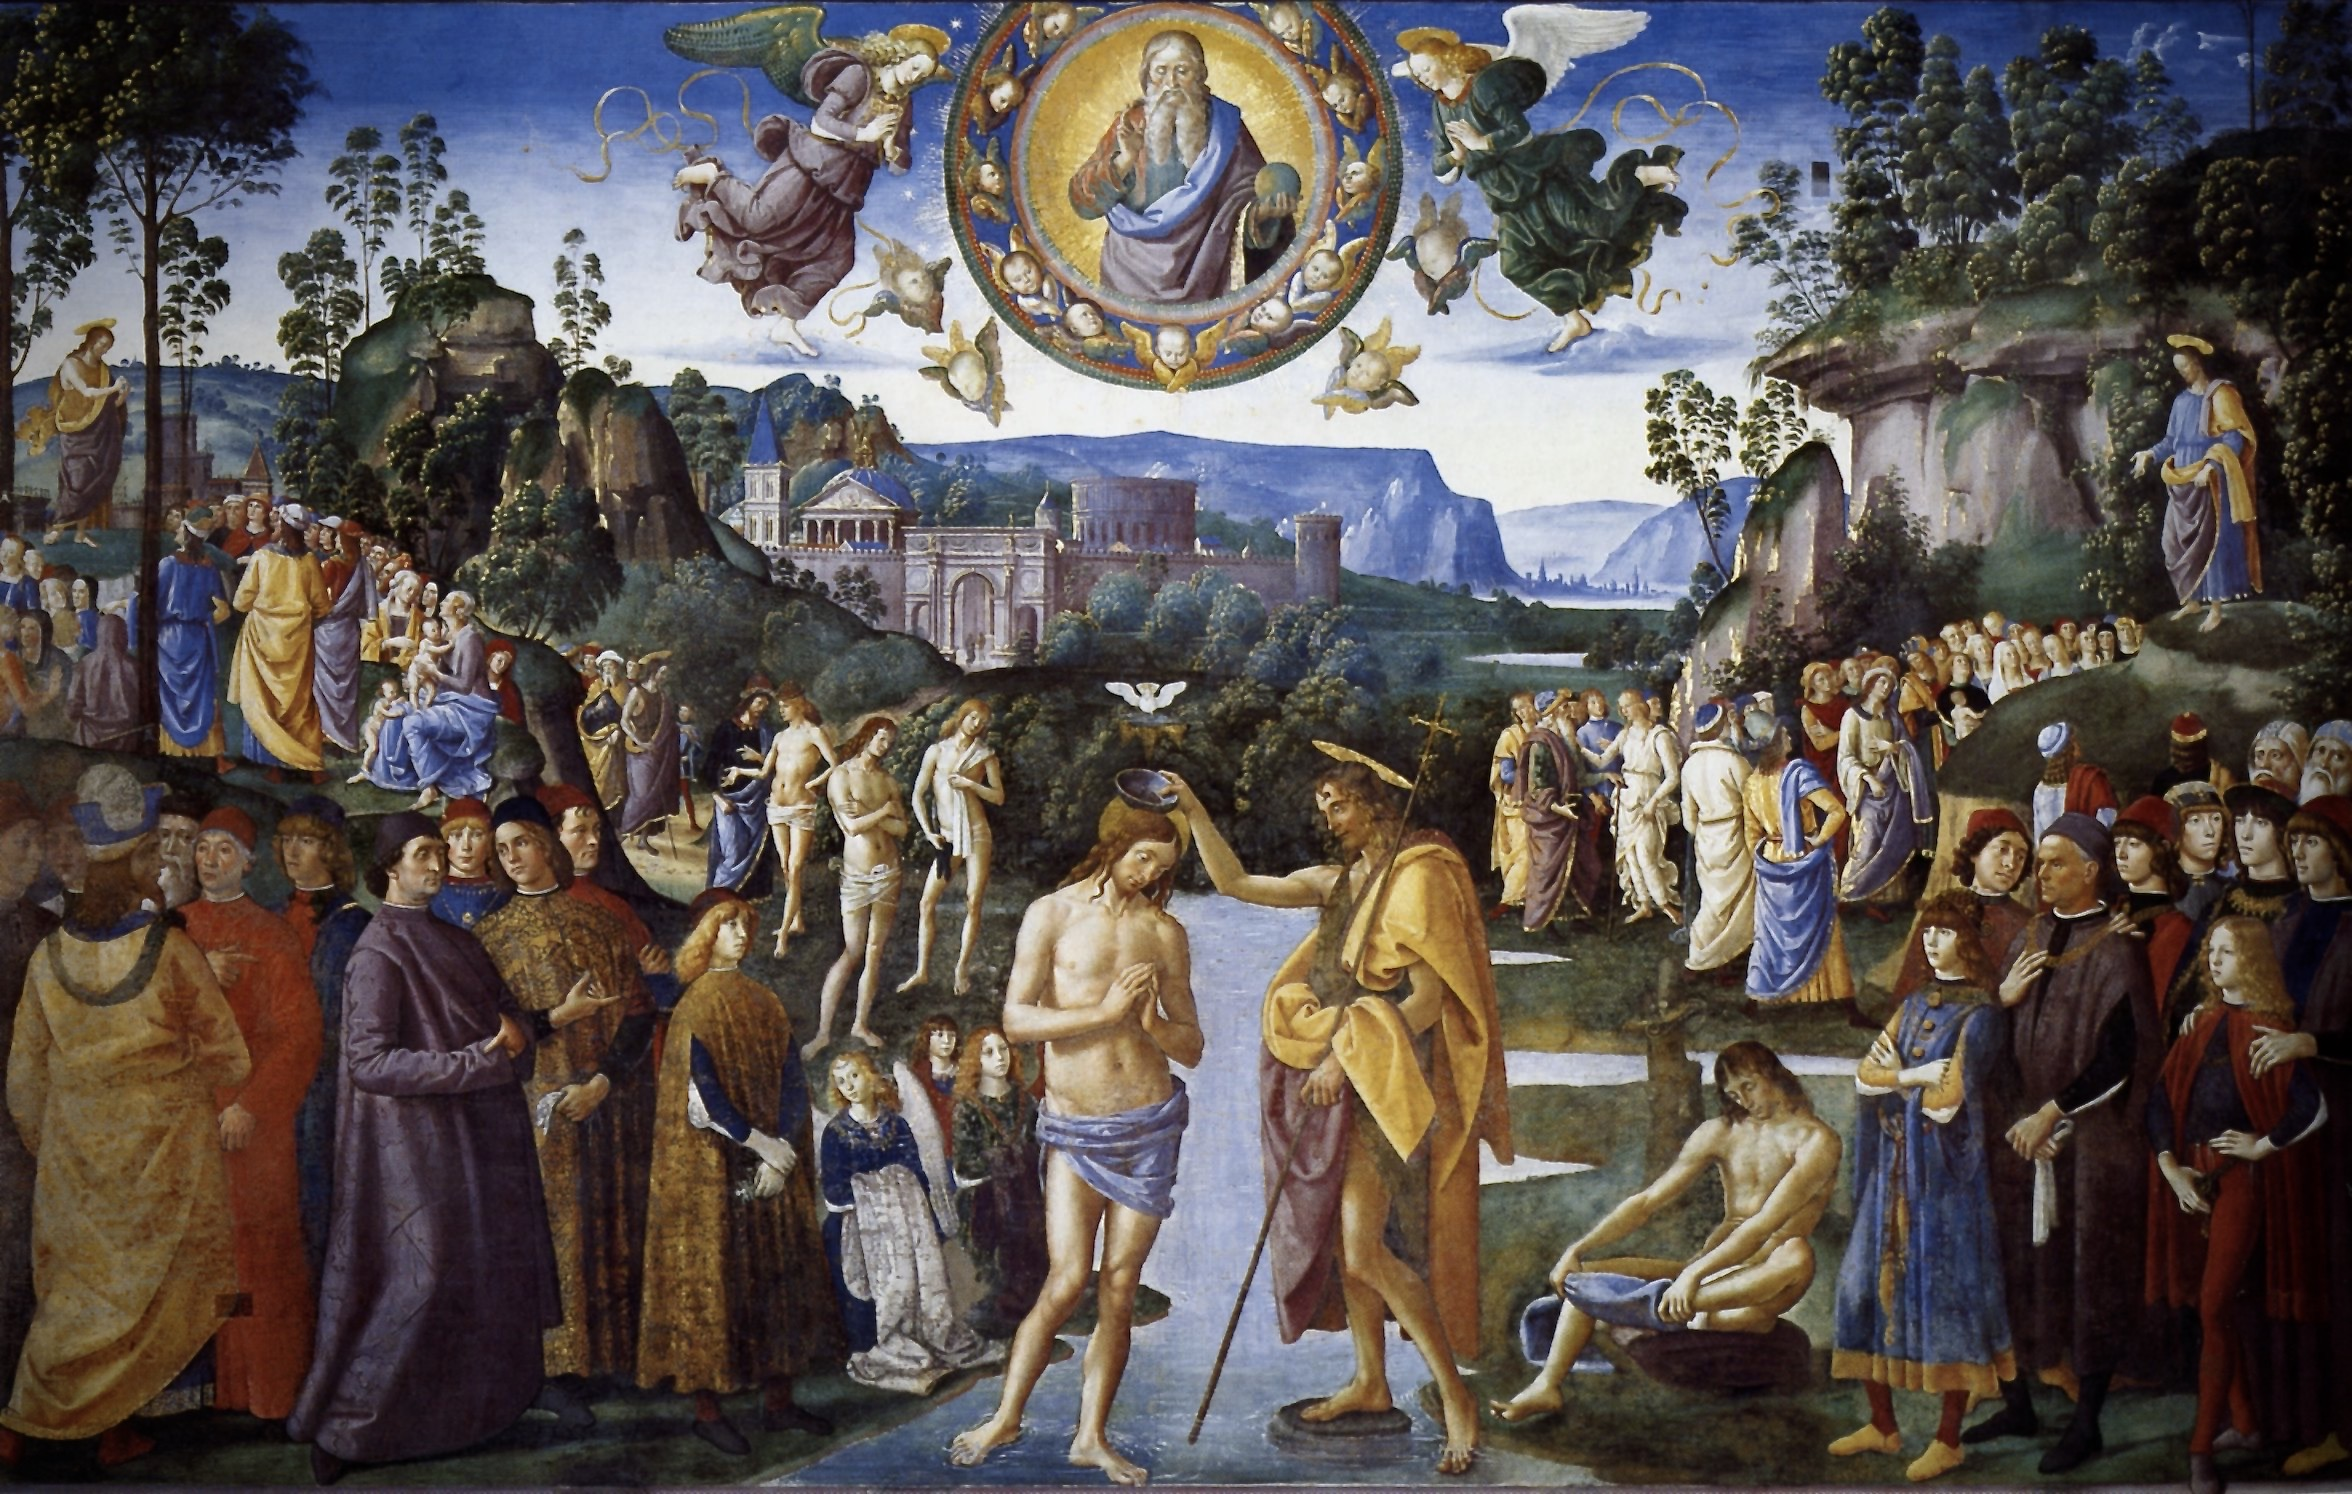 Pietro_Perugino_-_Baptism_of_Christ_-_Sistine_Chapel_-_cat13a